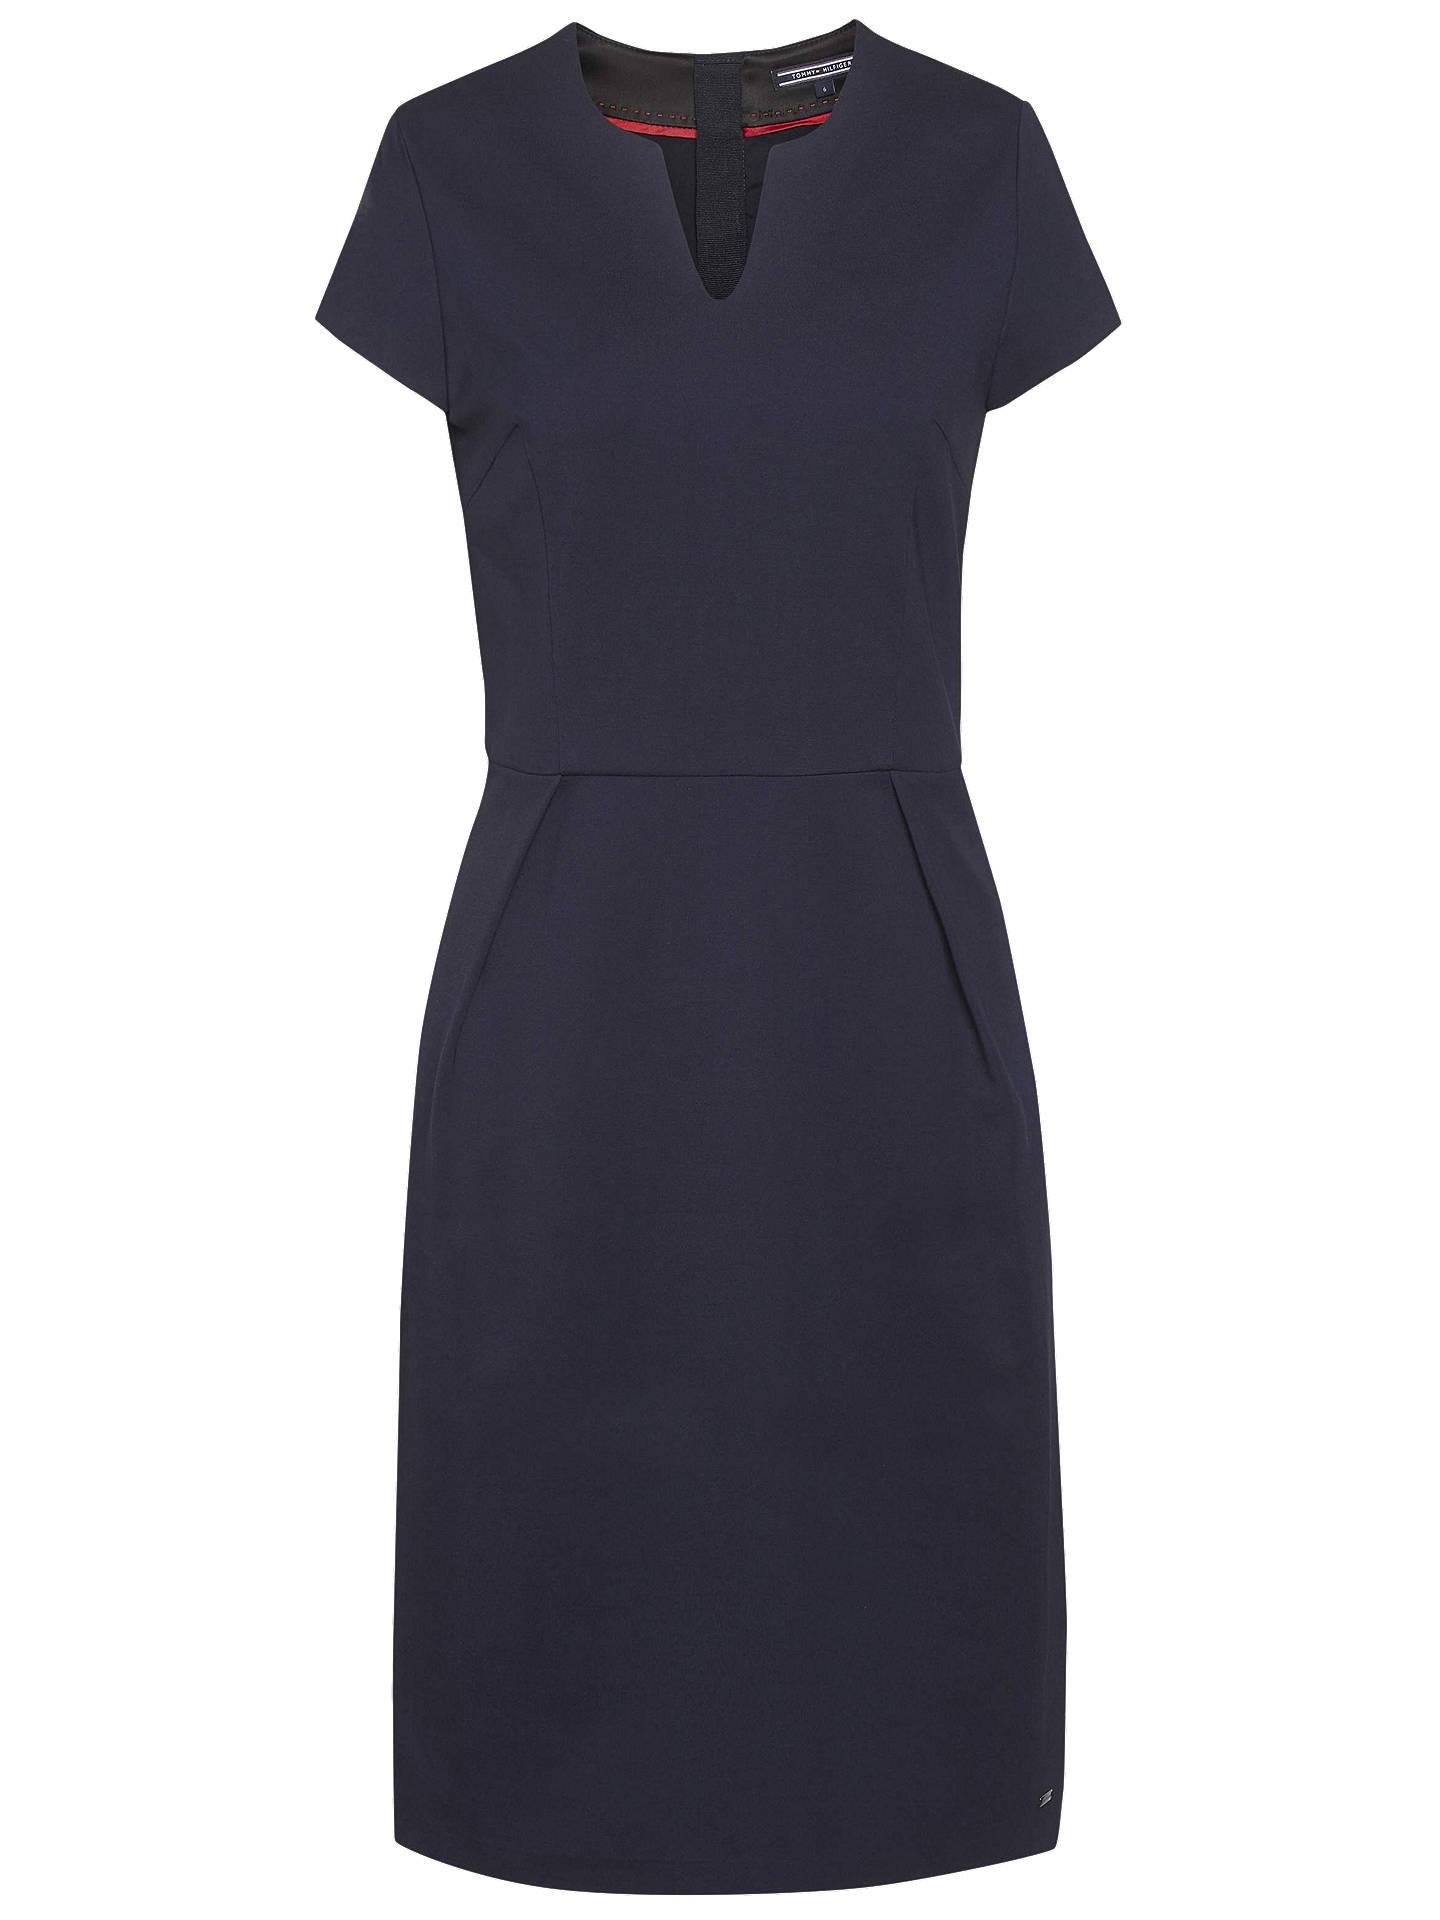 ddc0cf15f59fd Buy Tommy Hilfiger Imogen Dress, Night Sky, 8 Online at johnlewis.com ...